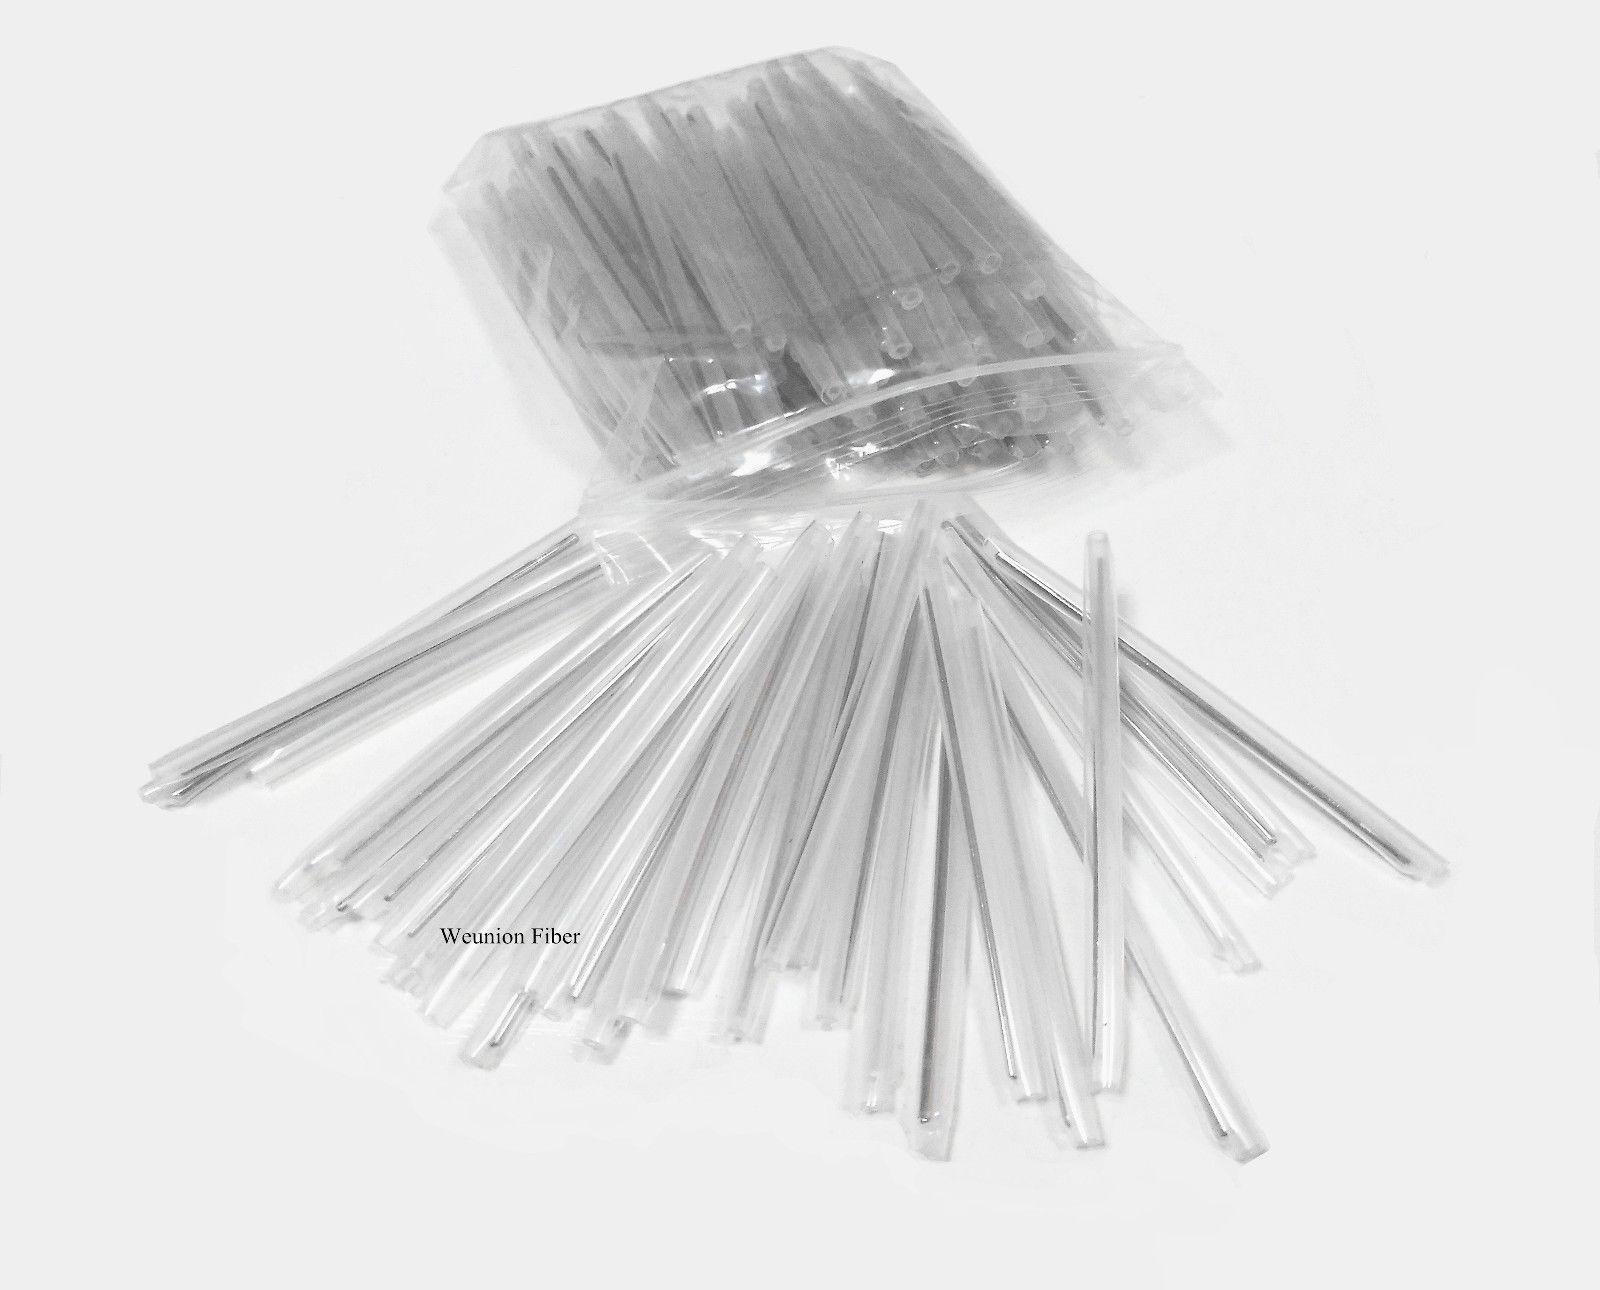 45mm Heat Shrink Tube Clear 500pcs ¢2.5 Fiber Fusion Splice Protection Sleeve